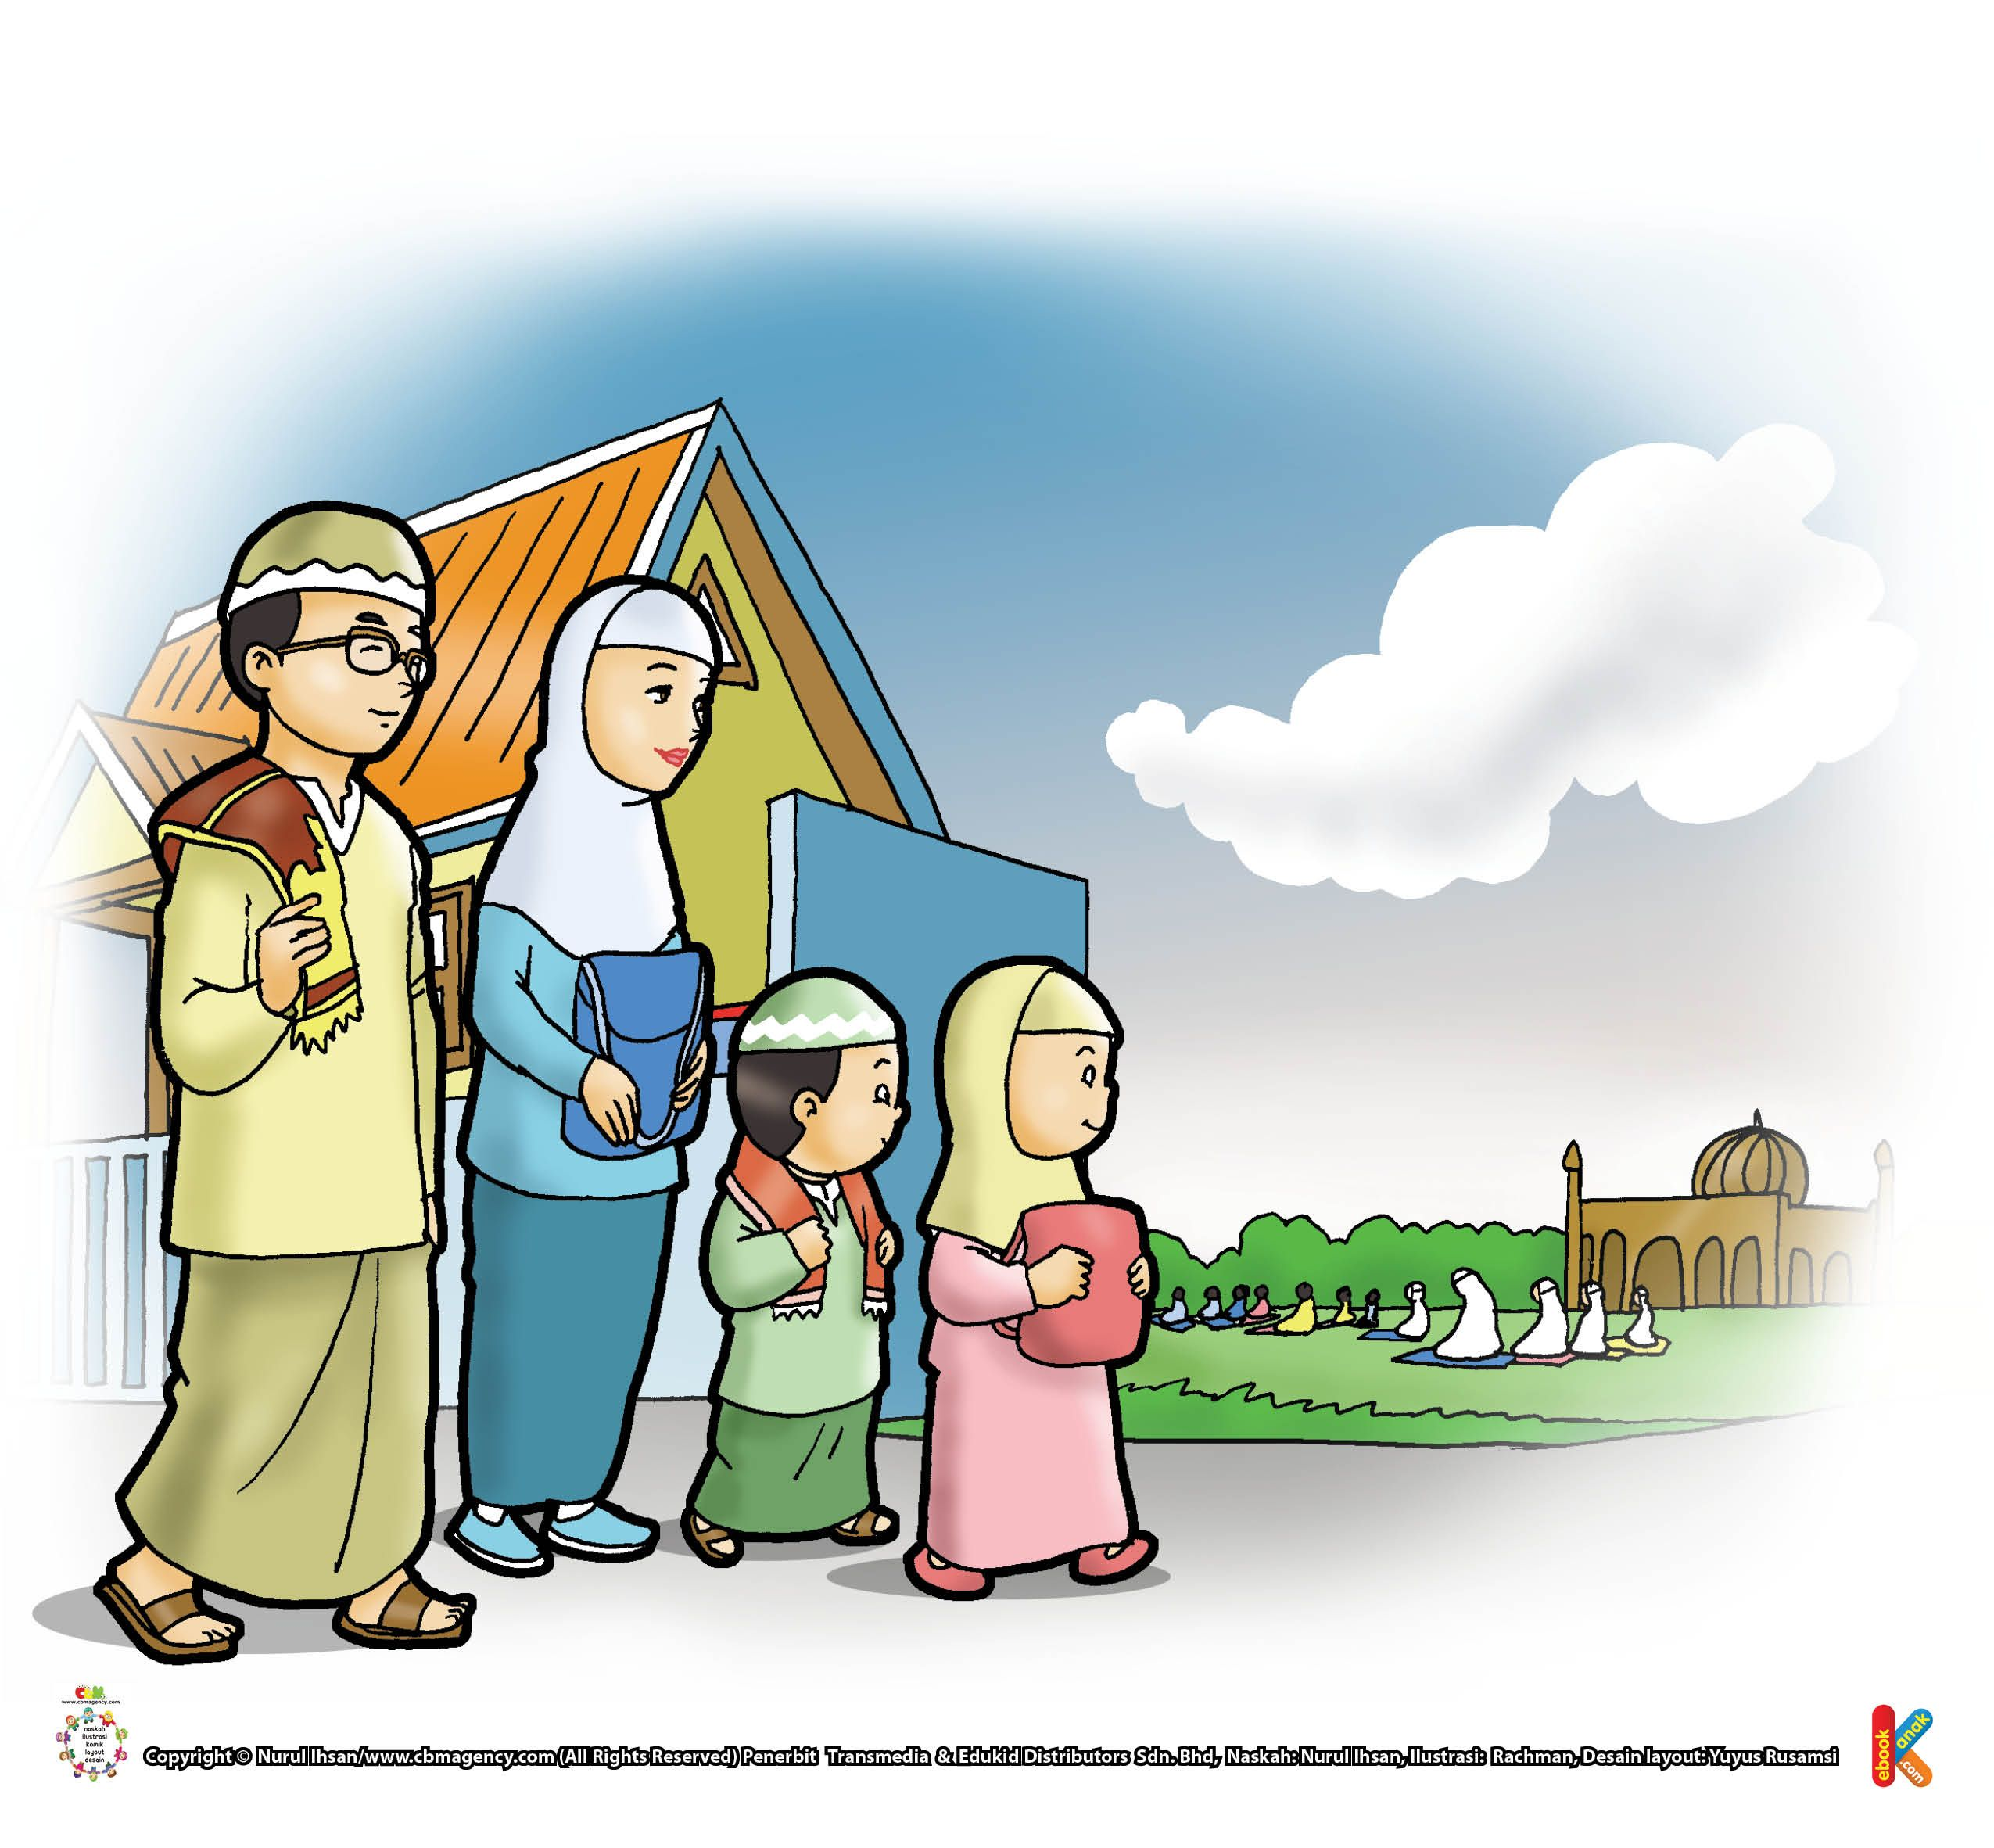 Gambar Animasi Anak Muslim Pergi Sholat Kata Nabi Pergi Shalat Idul Fitri Jalan Kaki Ebook Anak Kartun Anak Bepergian